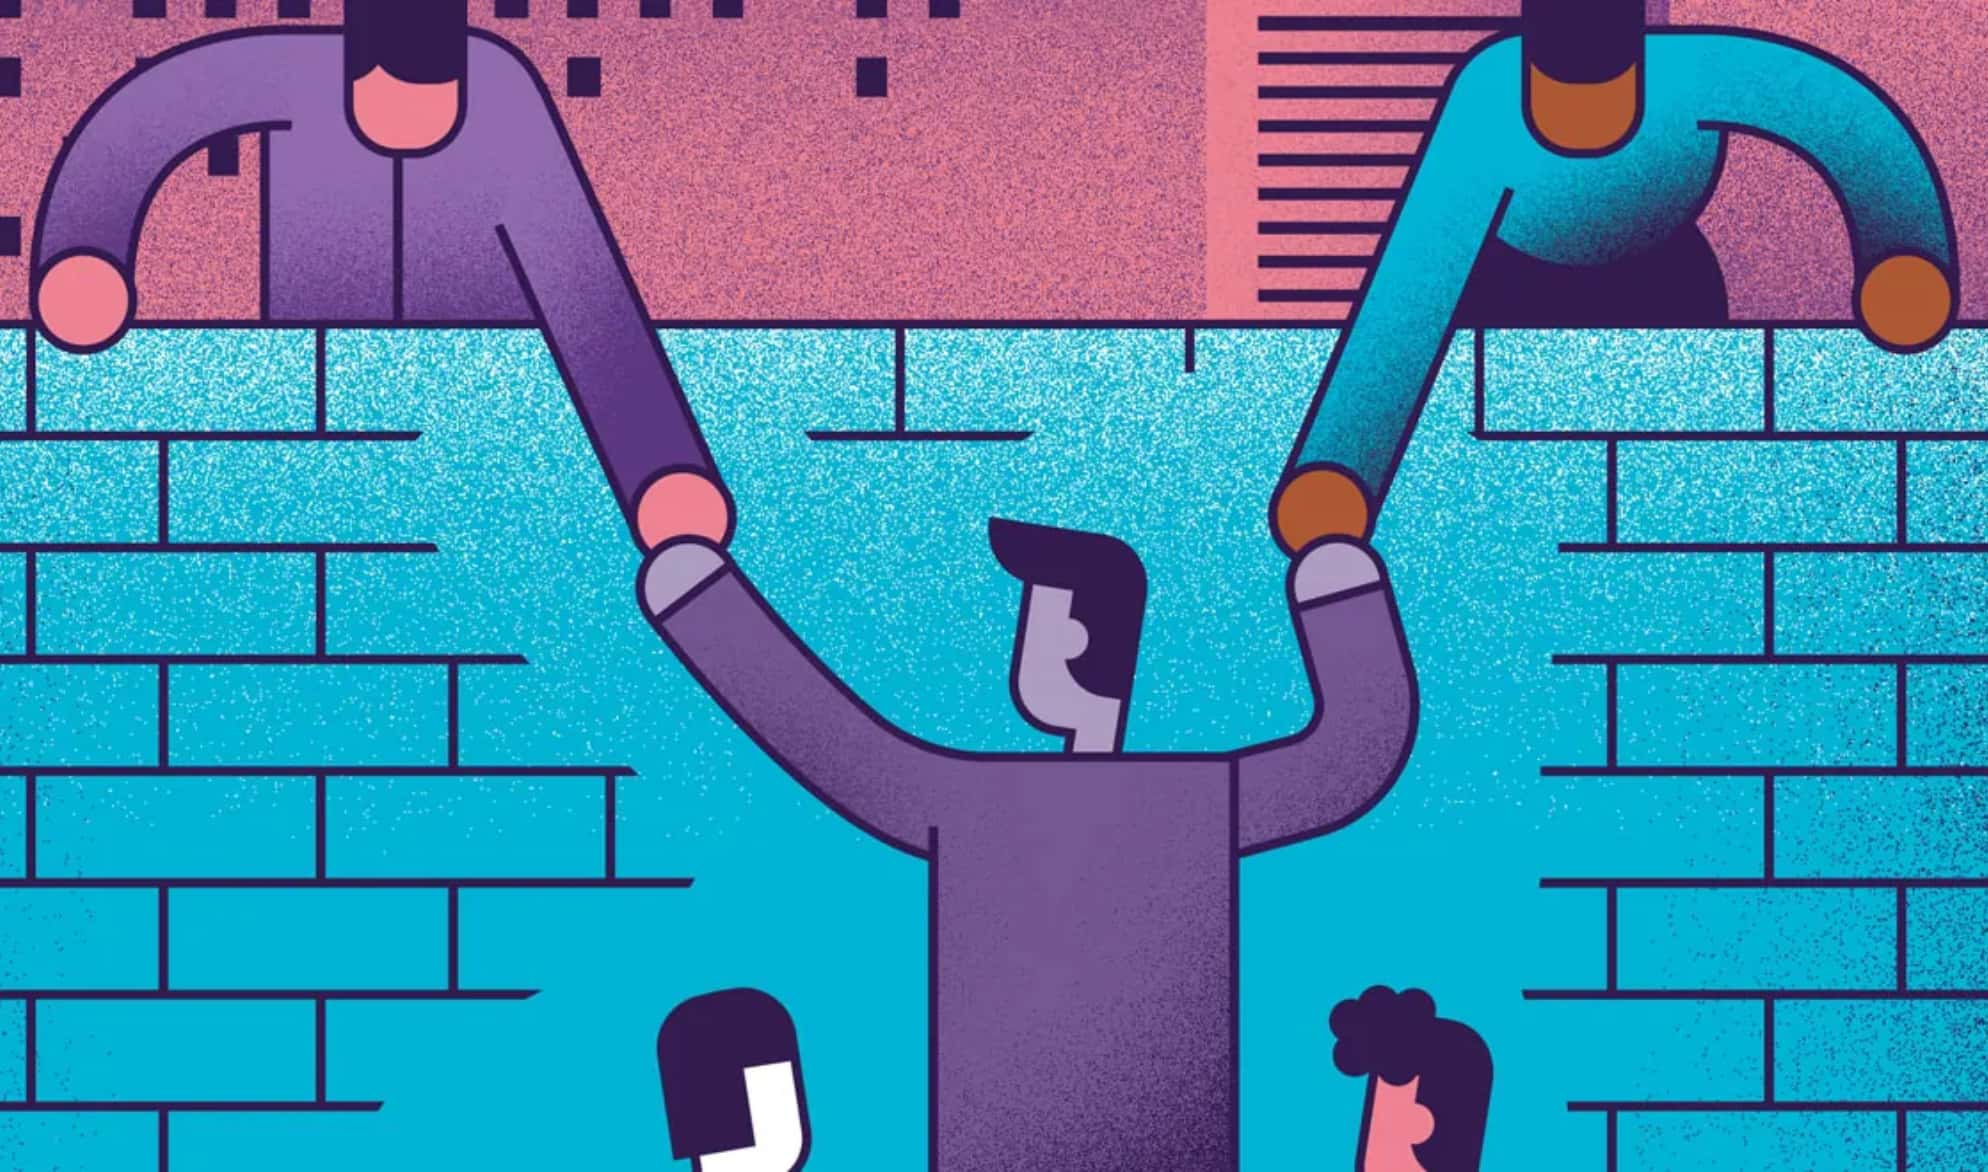 DAO 是 DeFi 的良配,持续性组织会是传统公司的选择吗?